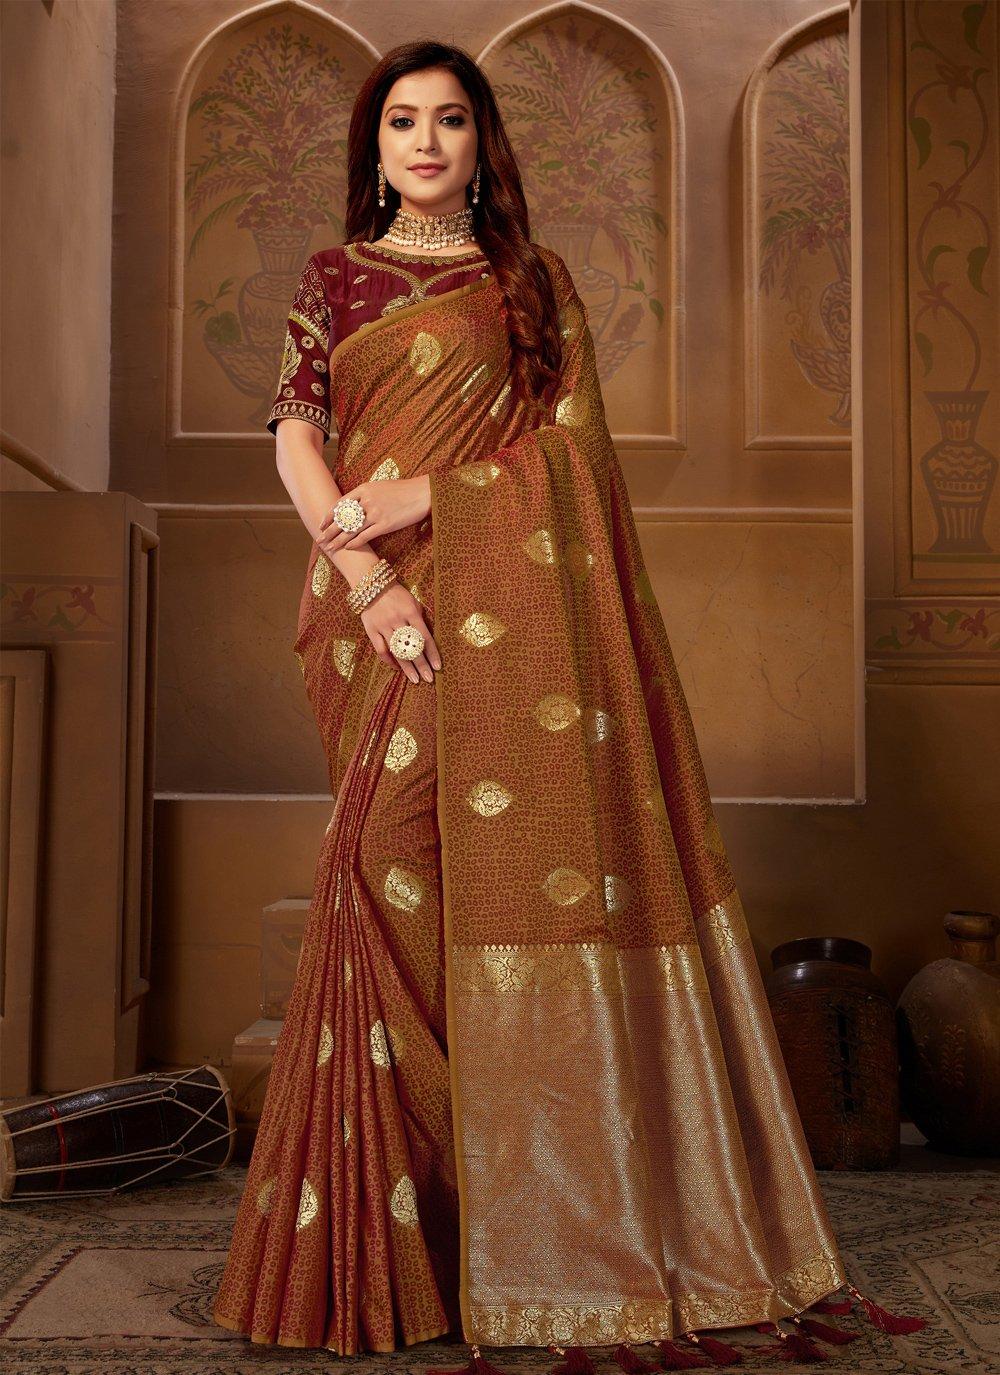 Designer Bollywood Saree For Sangeet